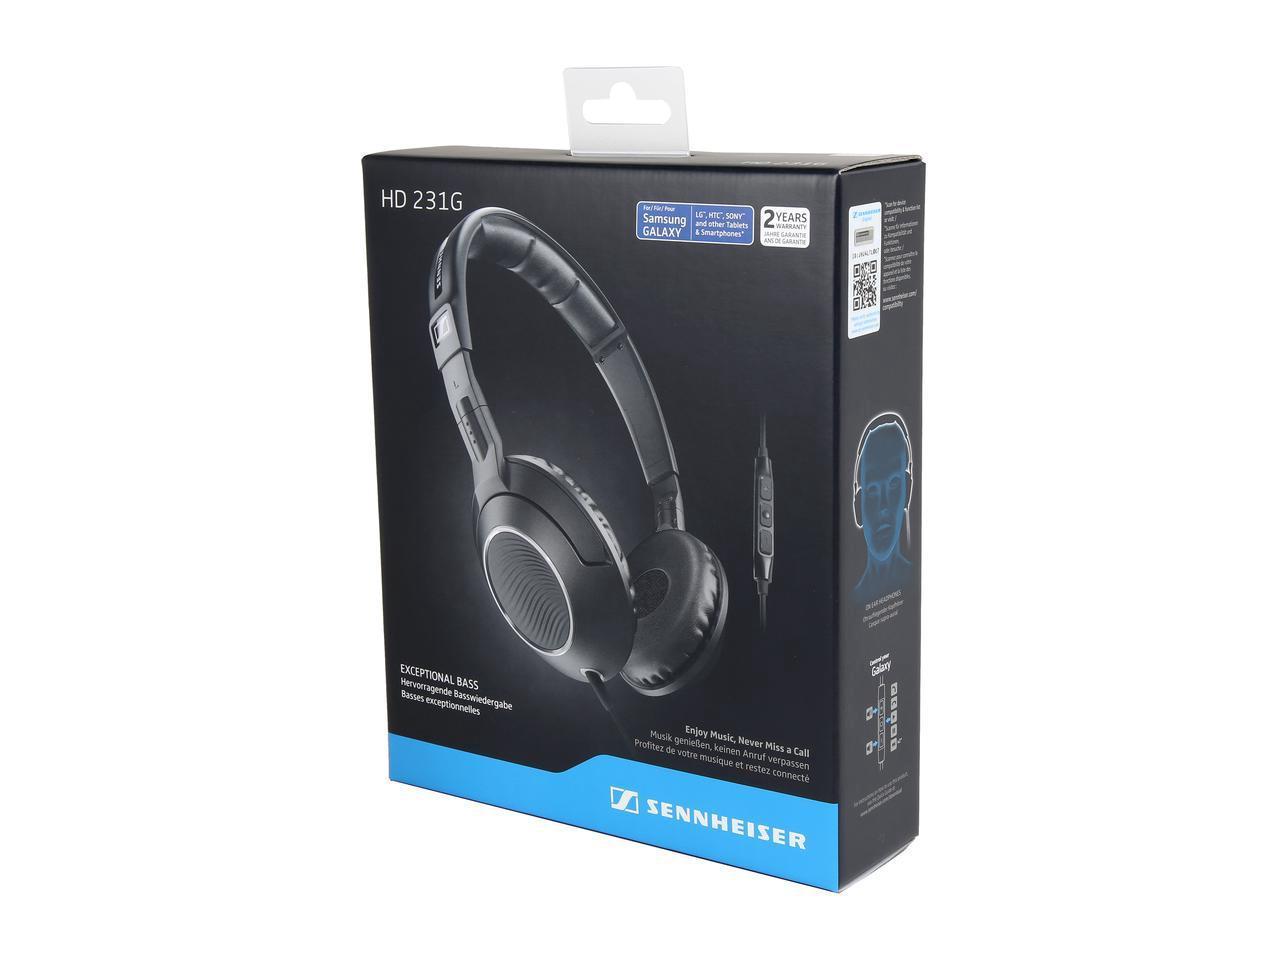 Sennheiser HD 231G On Ear Headphones w/ Inline Microphone/Remote (Black) $19.95 + Free Shipping via Newegg